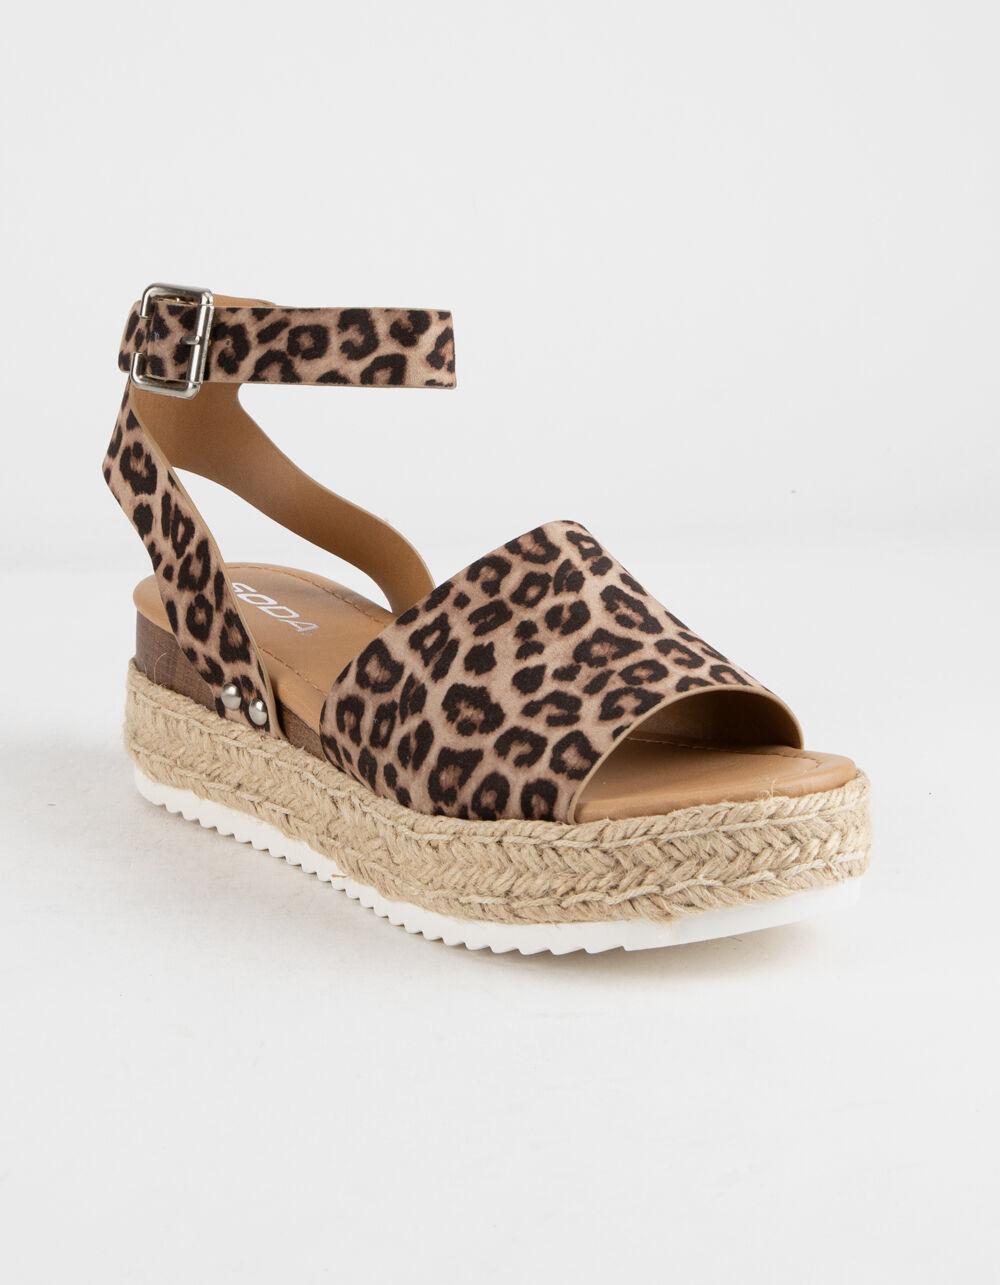 SODA Topic Cheetah Espadrille Flatform Sandals